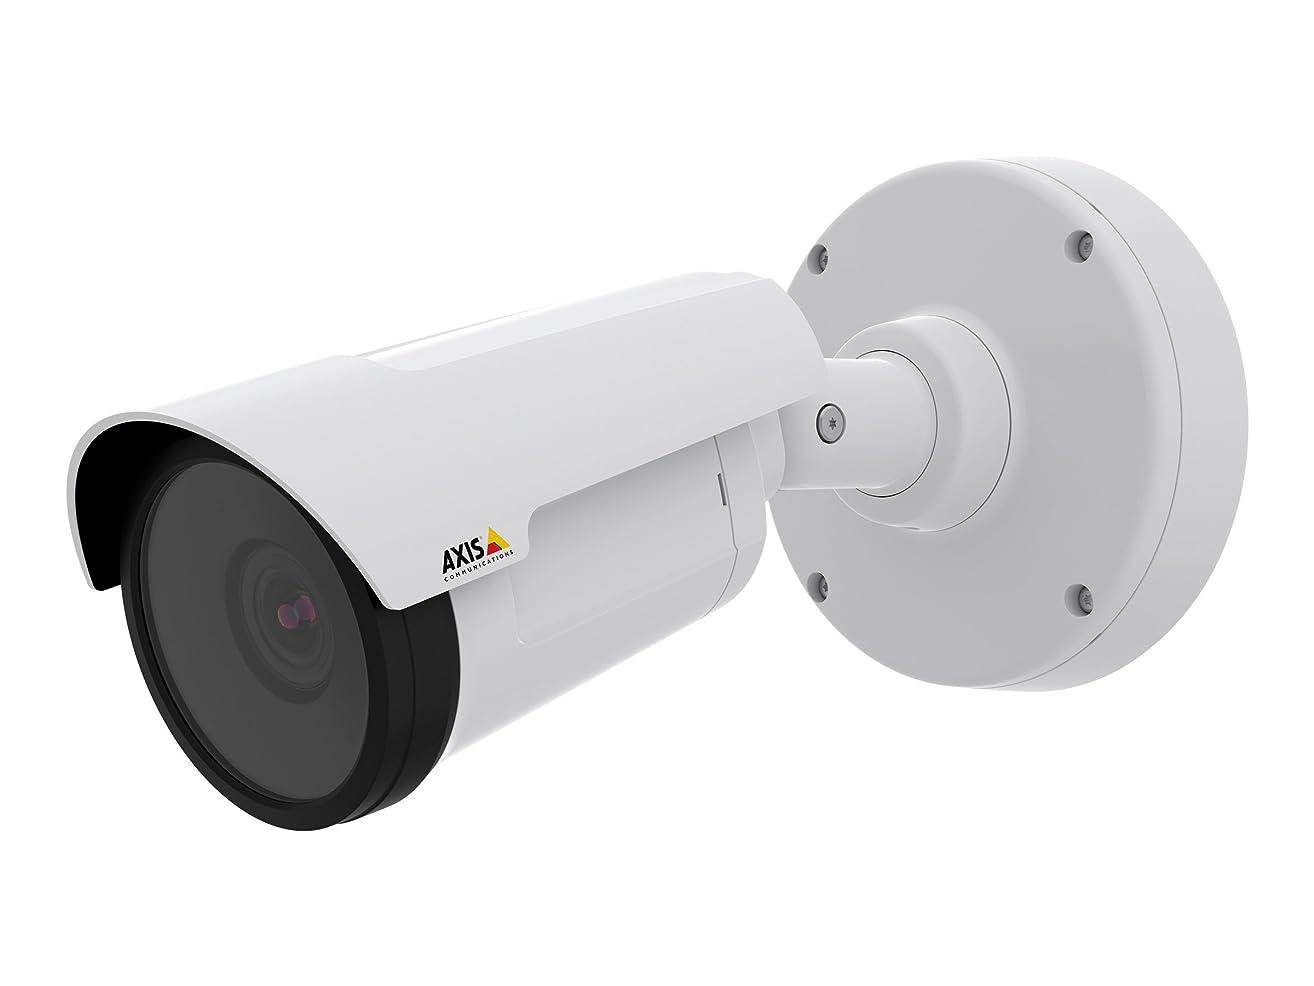 Axis P1428-E Network Camera - Network Surveillance Camera - White